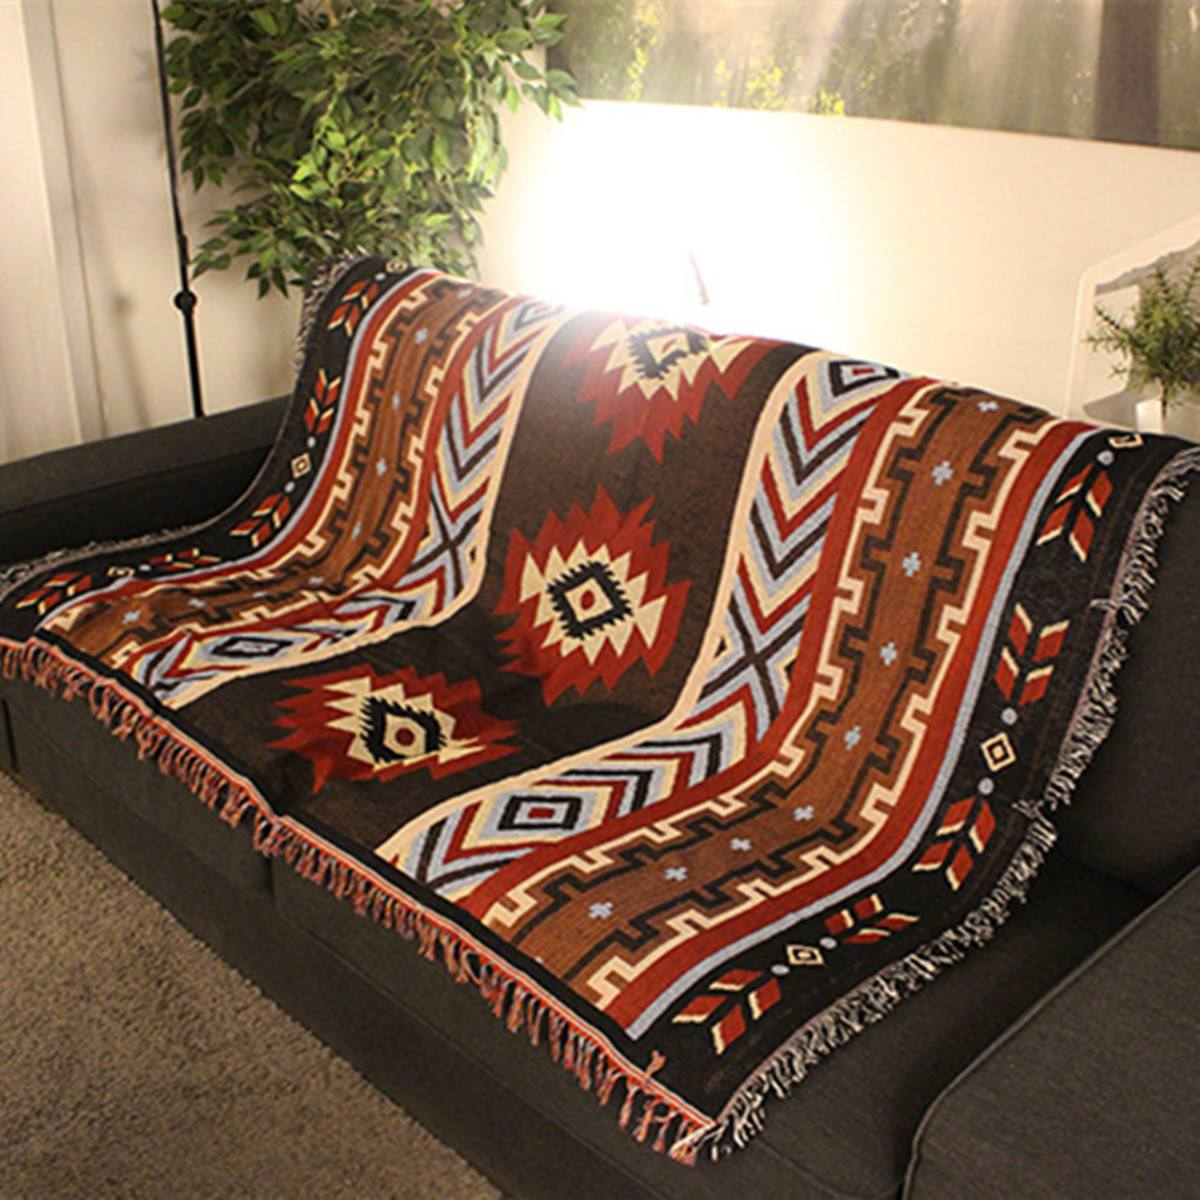 130x160cm Home Decor Aztec Navajo Towel Mat Throw Wall Hanging Cotton Rugs Classic Woven Machine Washable Picnic Sofa Blanket